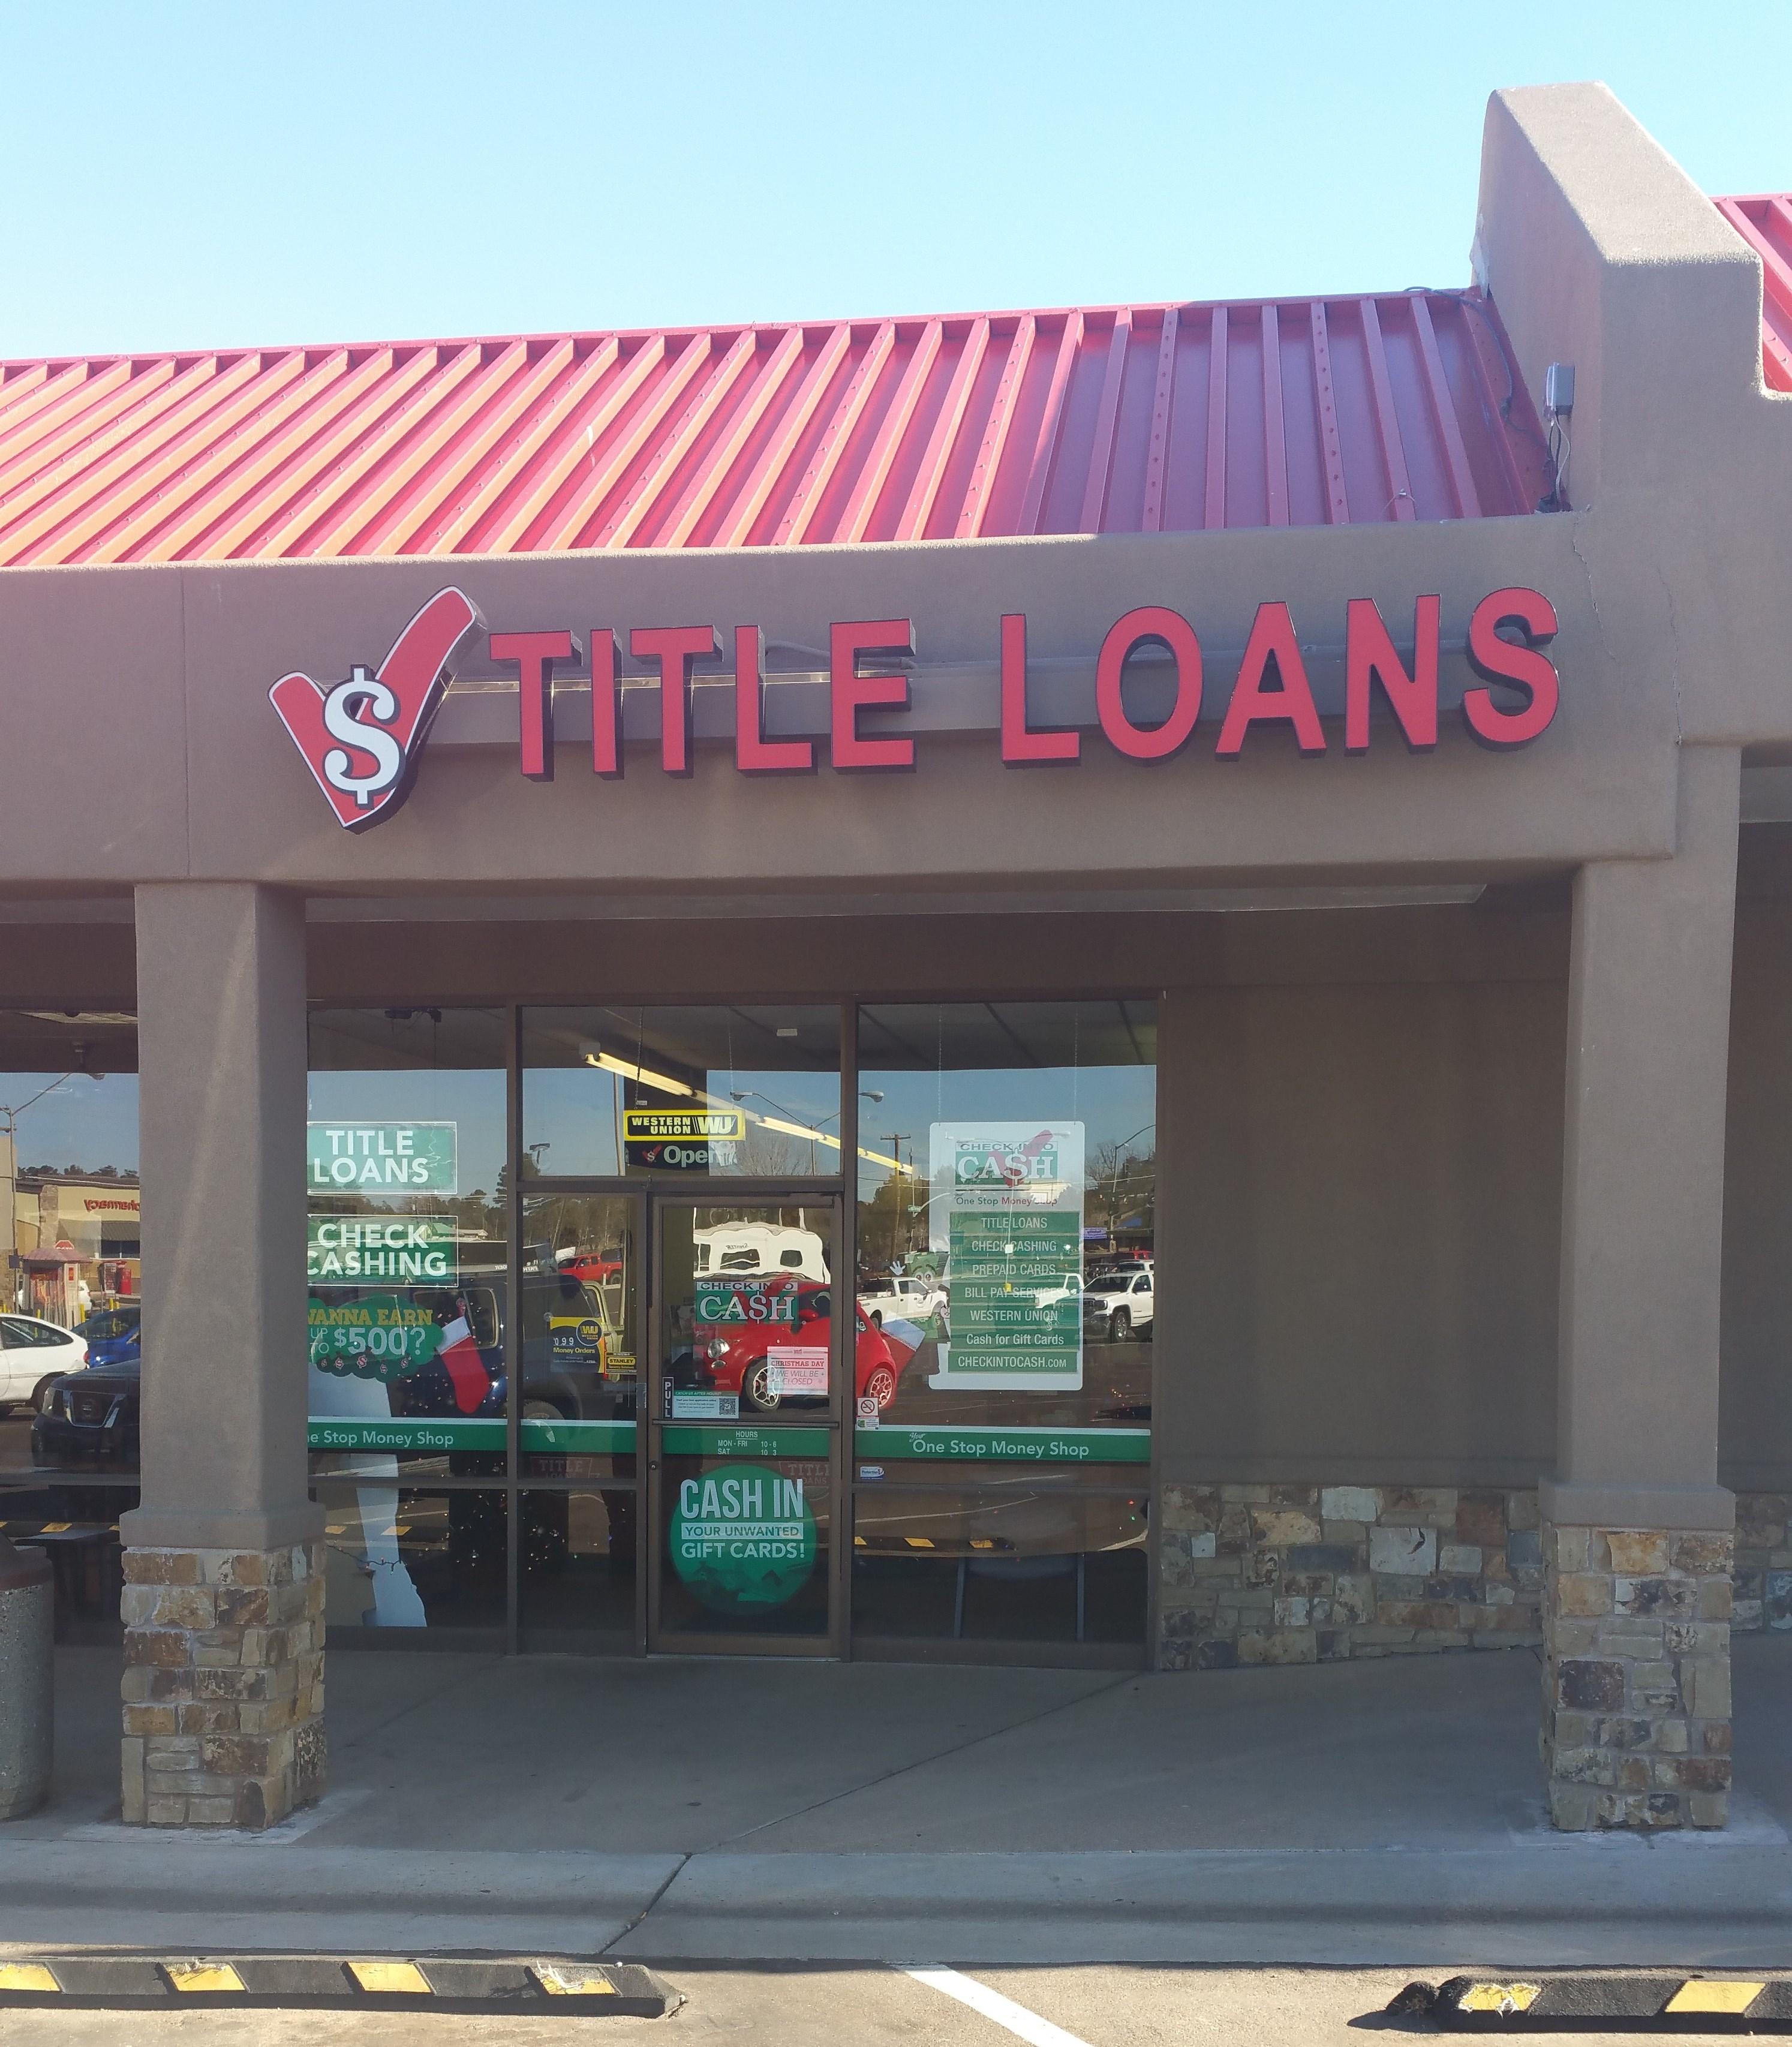 2000 pound payday loan image 9